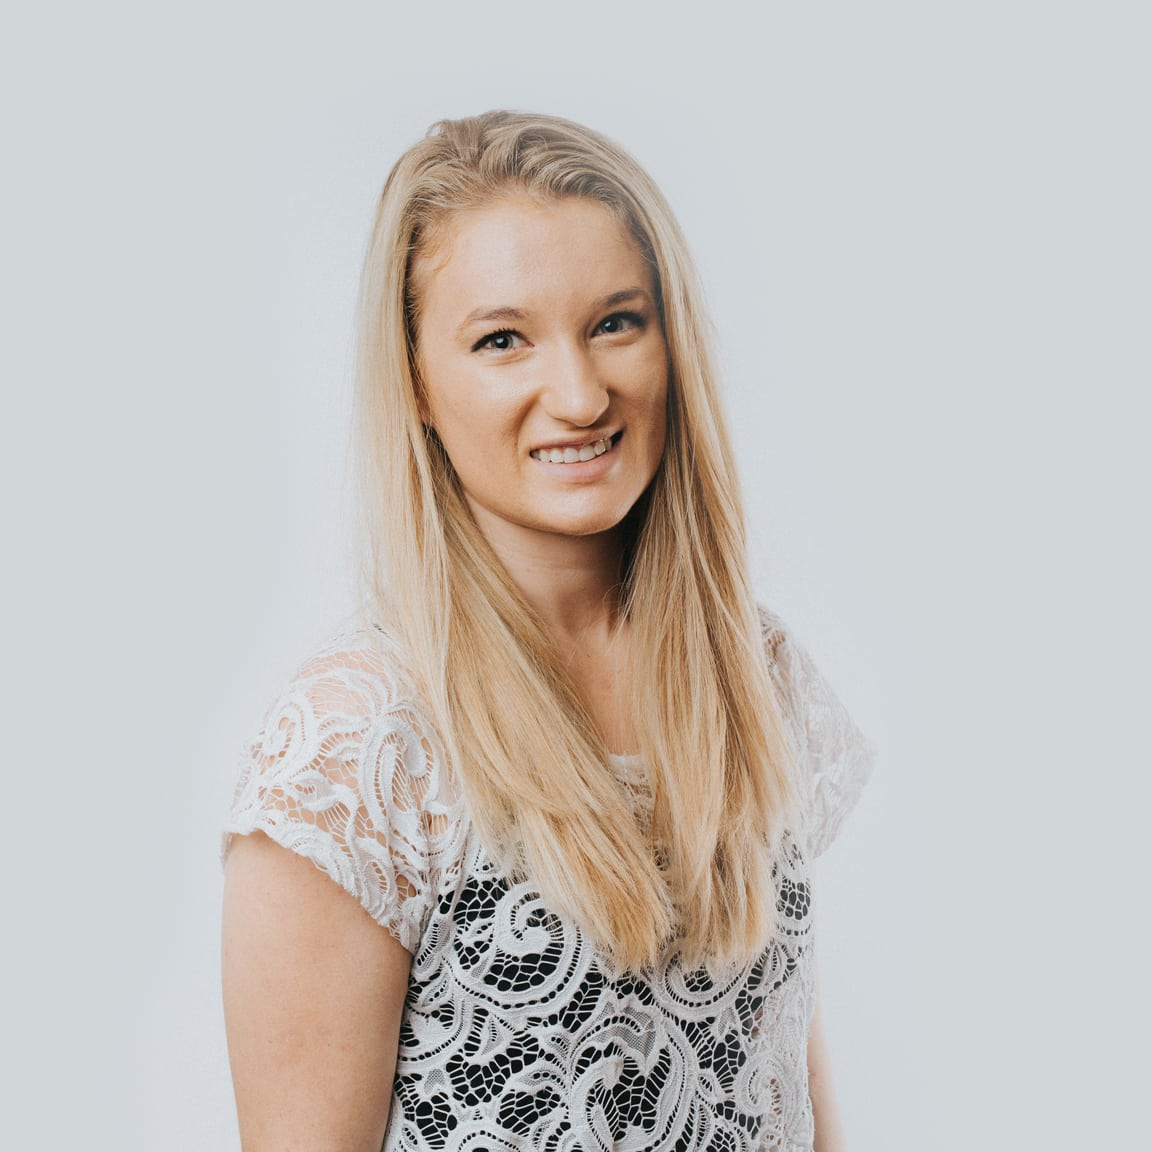 Heather-Portrait